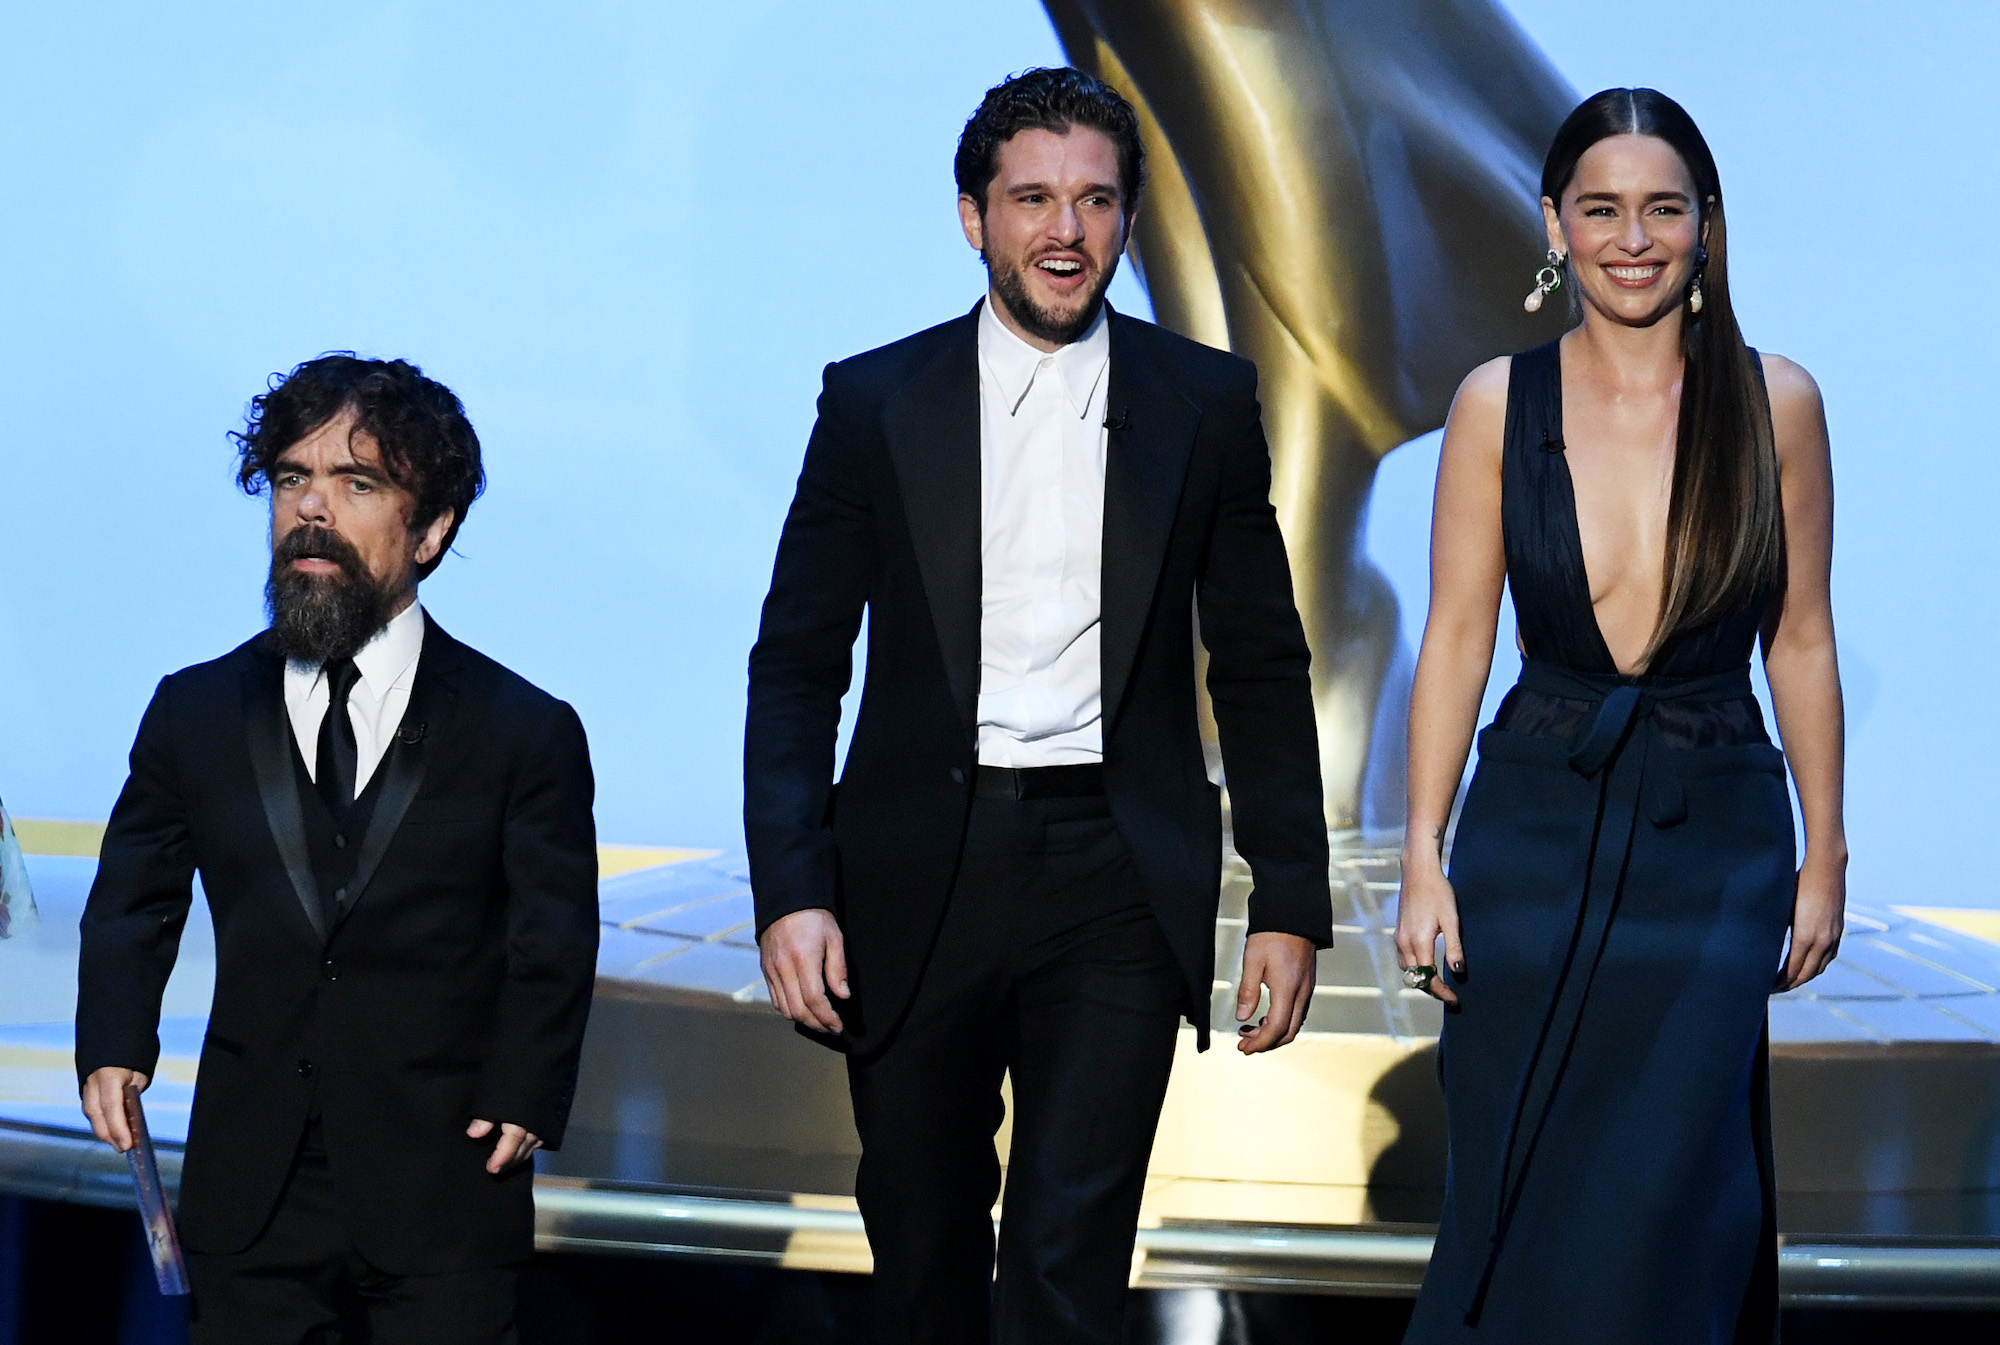 Peter Dinklage, Kit Harington, and Emilia Clarke at the 71st Emmy Awards on Sept. 22, 2019